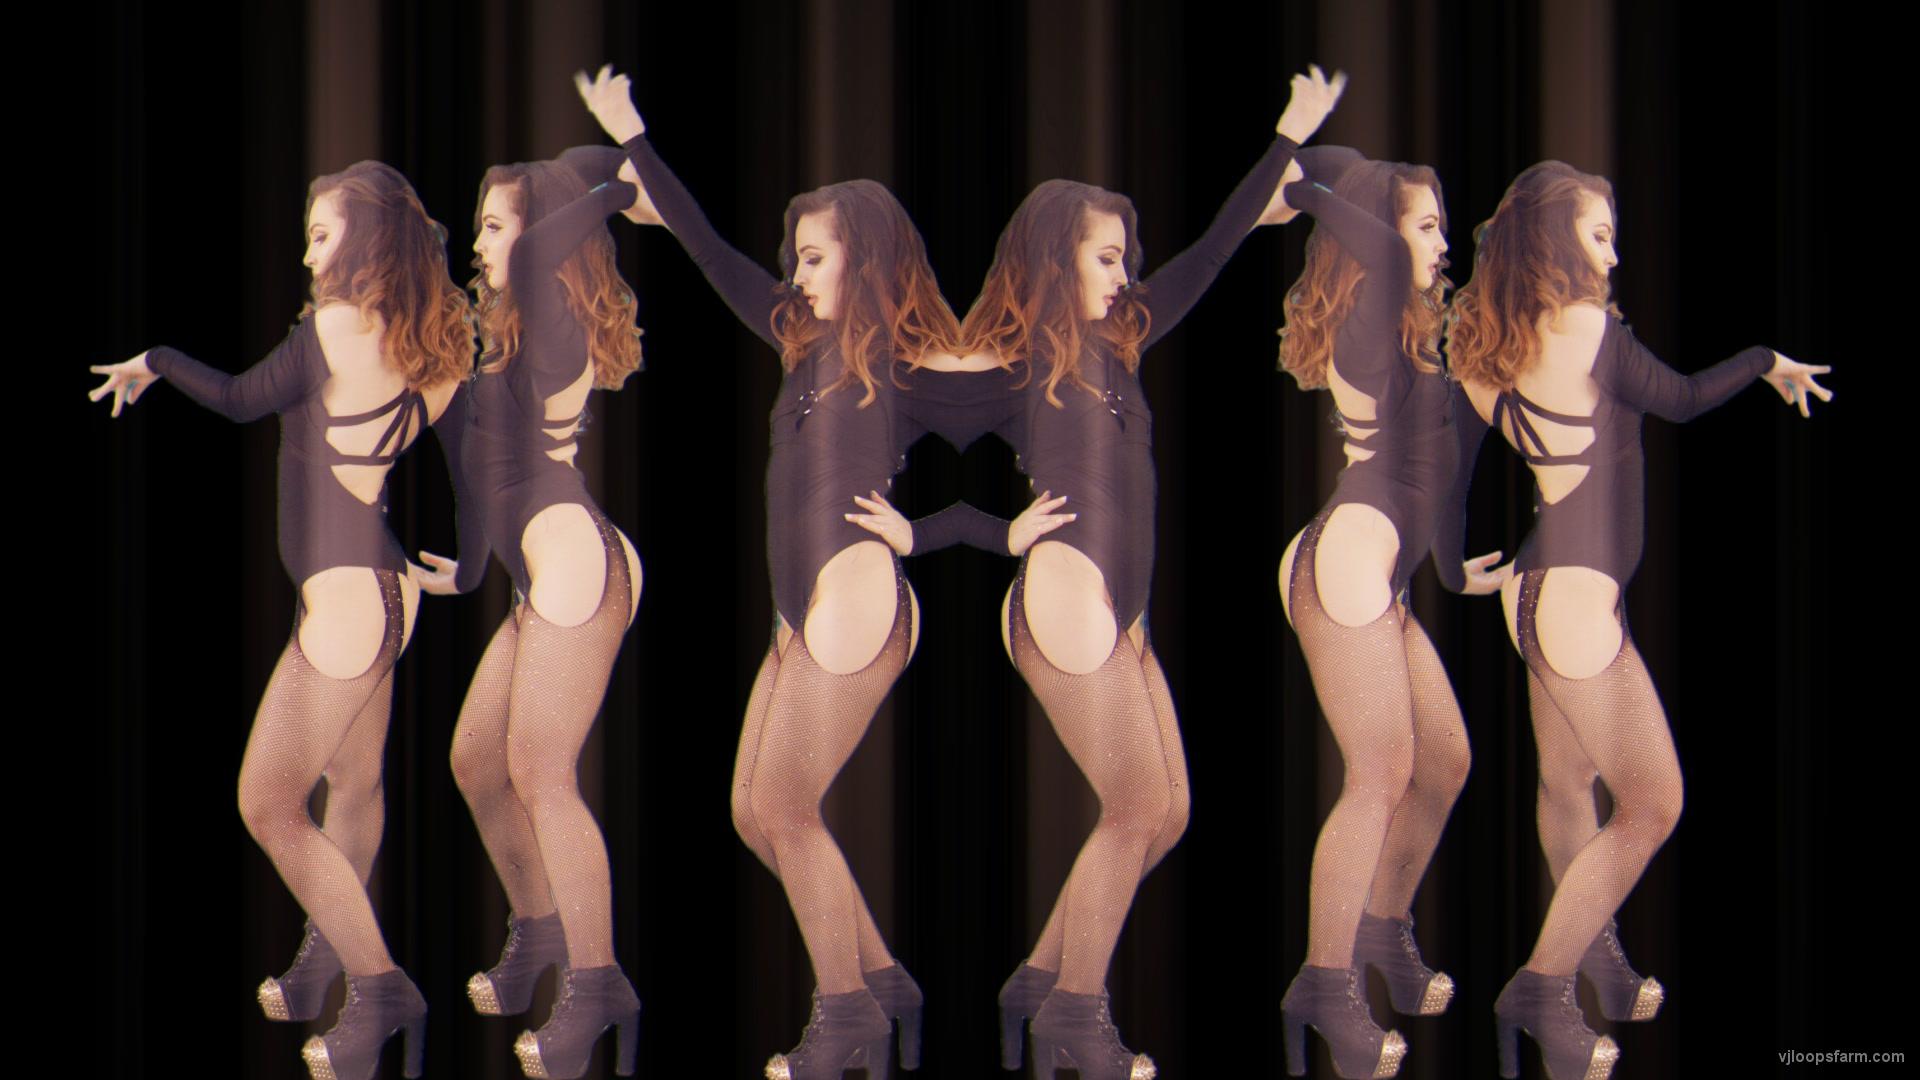 vj video background Dancig-GO-GO-Girls-over-black-motion-backgroun-stock-footage-video-art-vj-loop_003